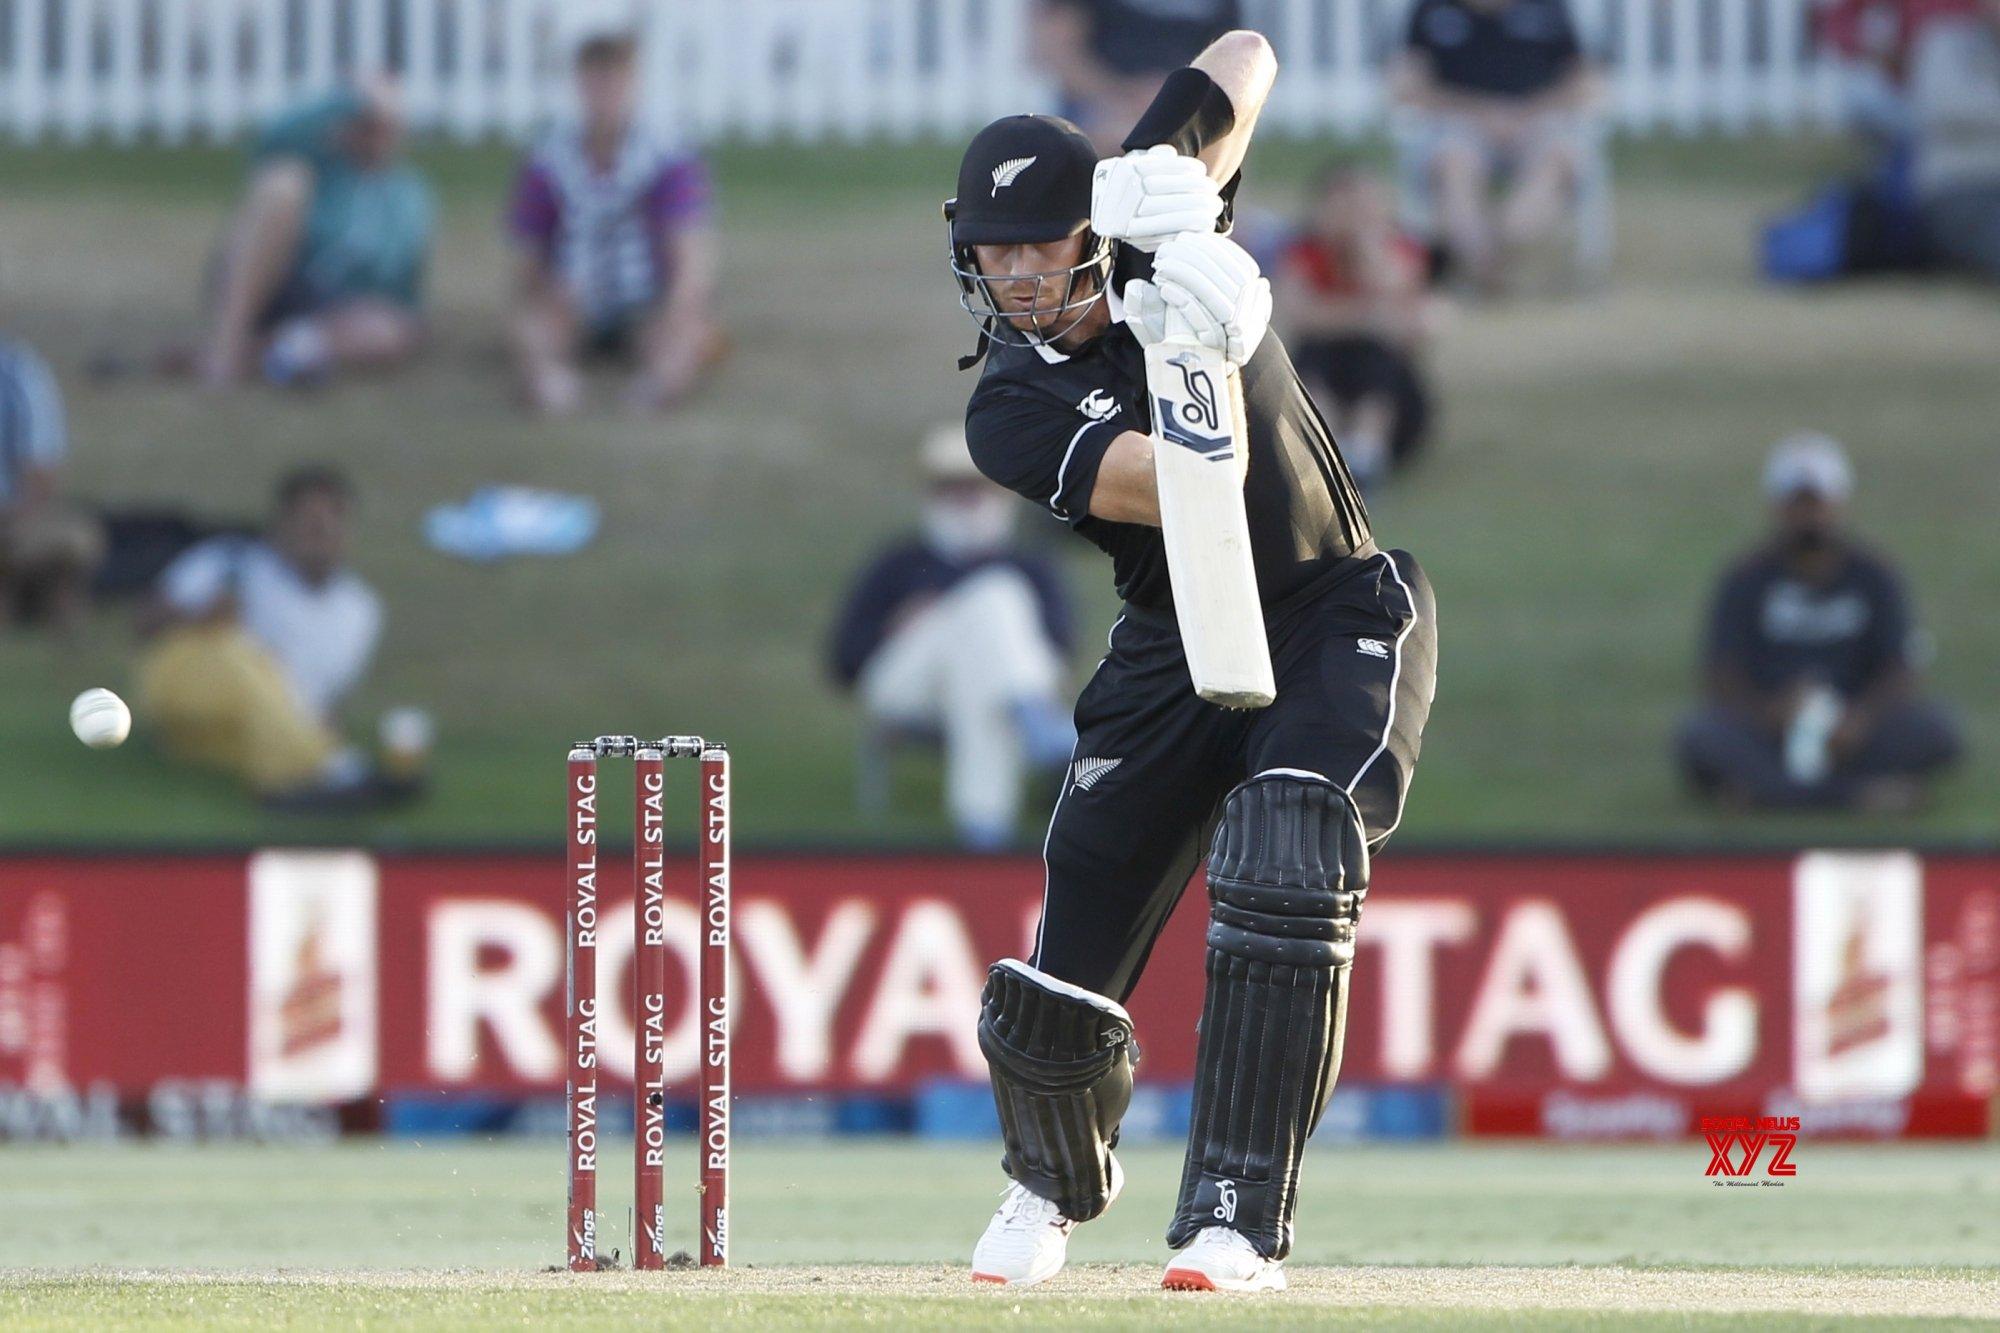 Mount Maunganui: 3rd ODI - India Vs New Zealand (Batch - 8) #Gallery